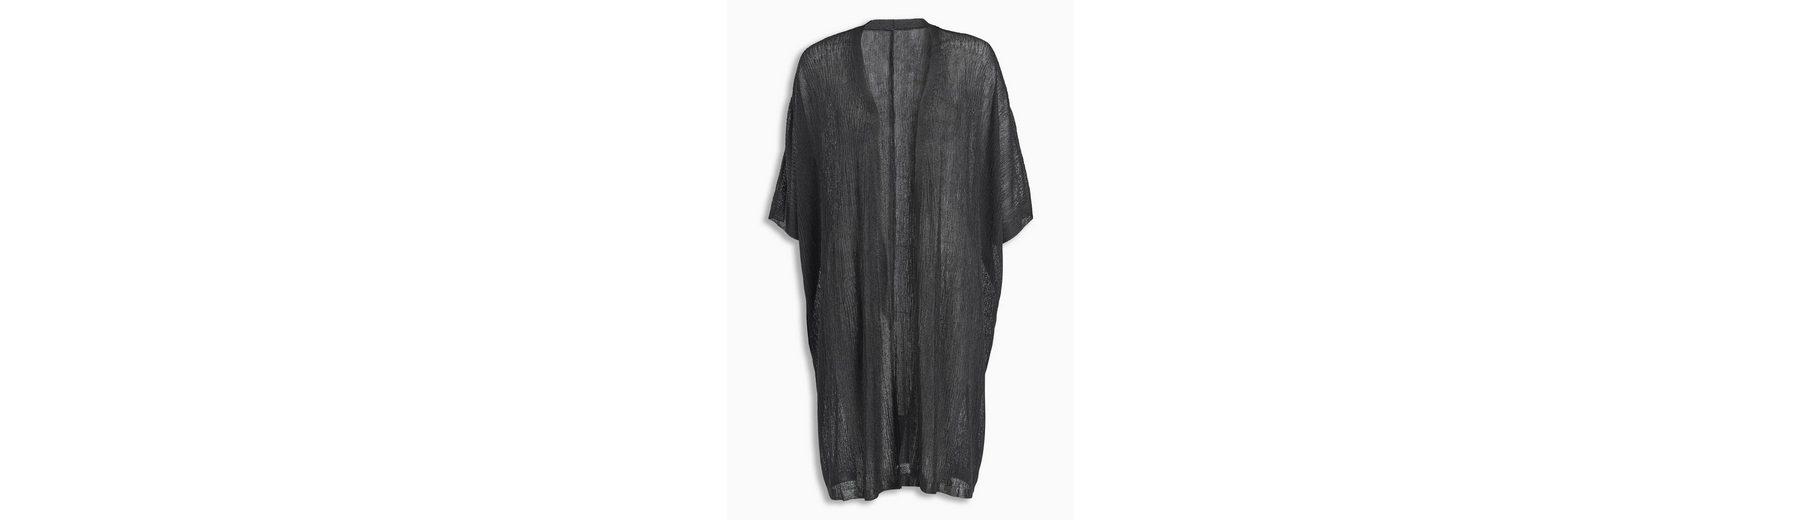 Next Strickjacke im Kimono-Look